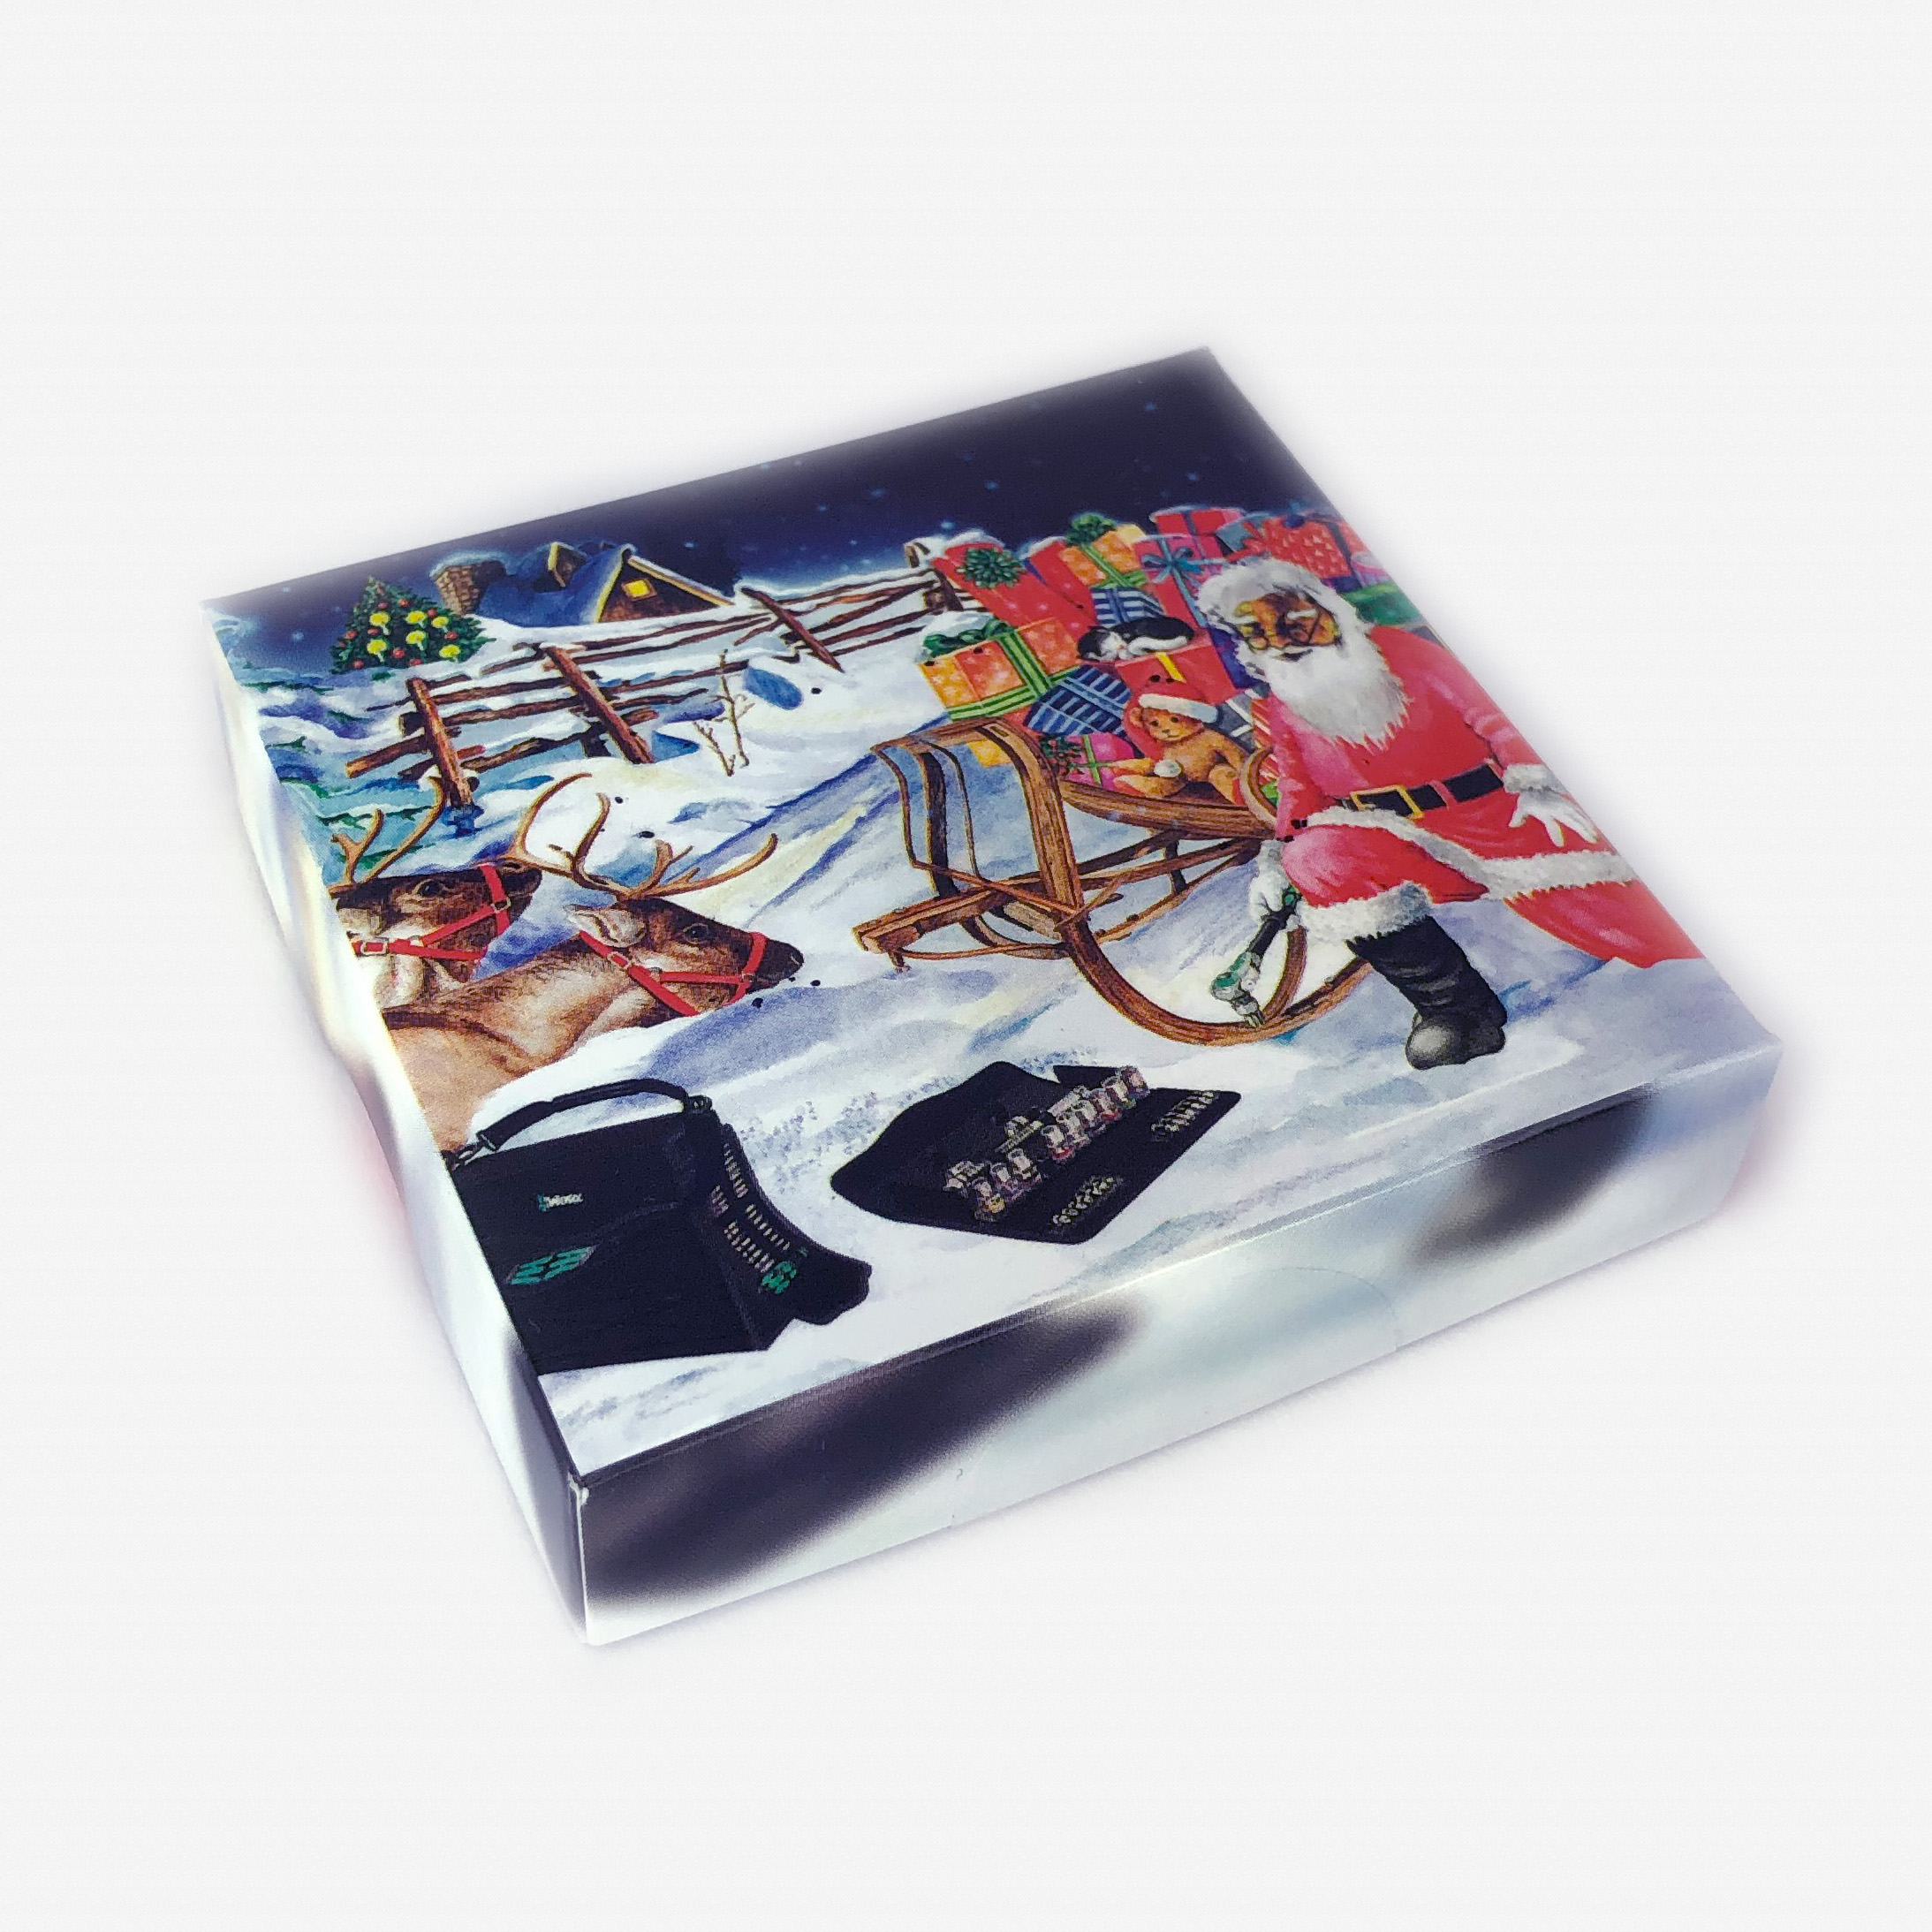 Wera 134904 Bit-Check Christmas 2019 Set - KC Tool